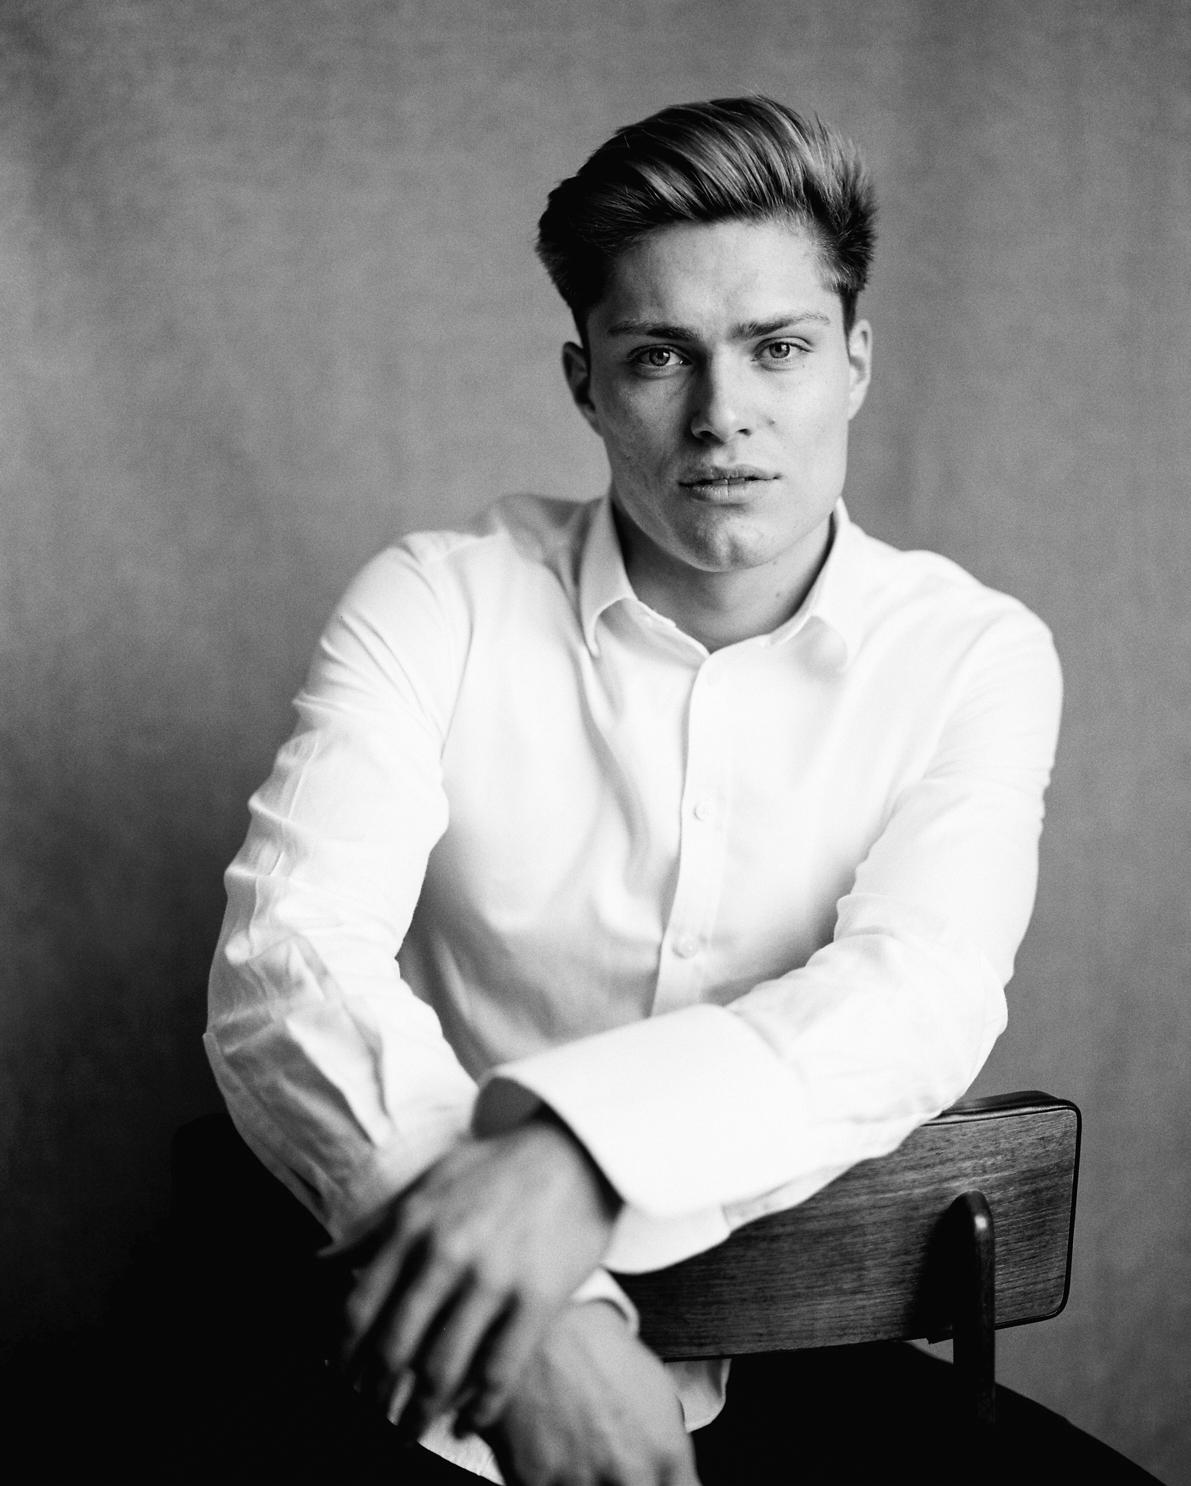 Portraits by Dmitry Serostanov in London